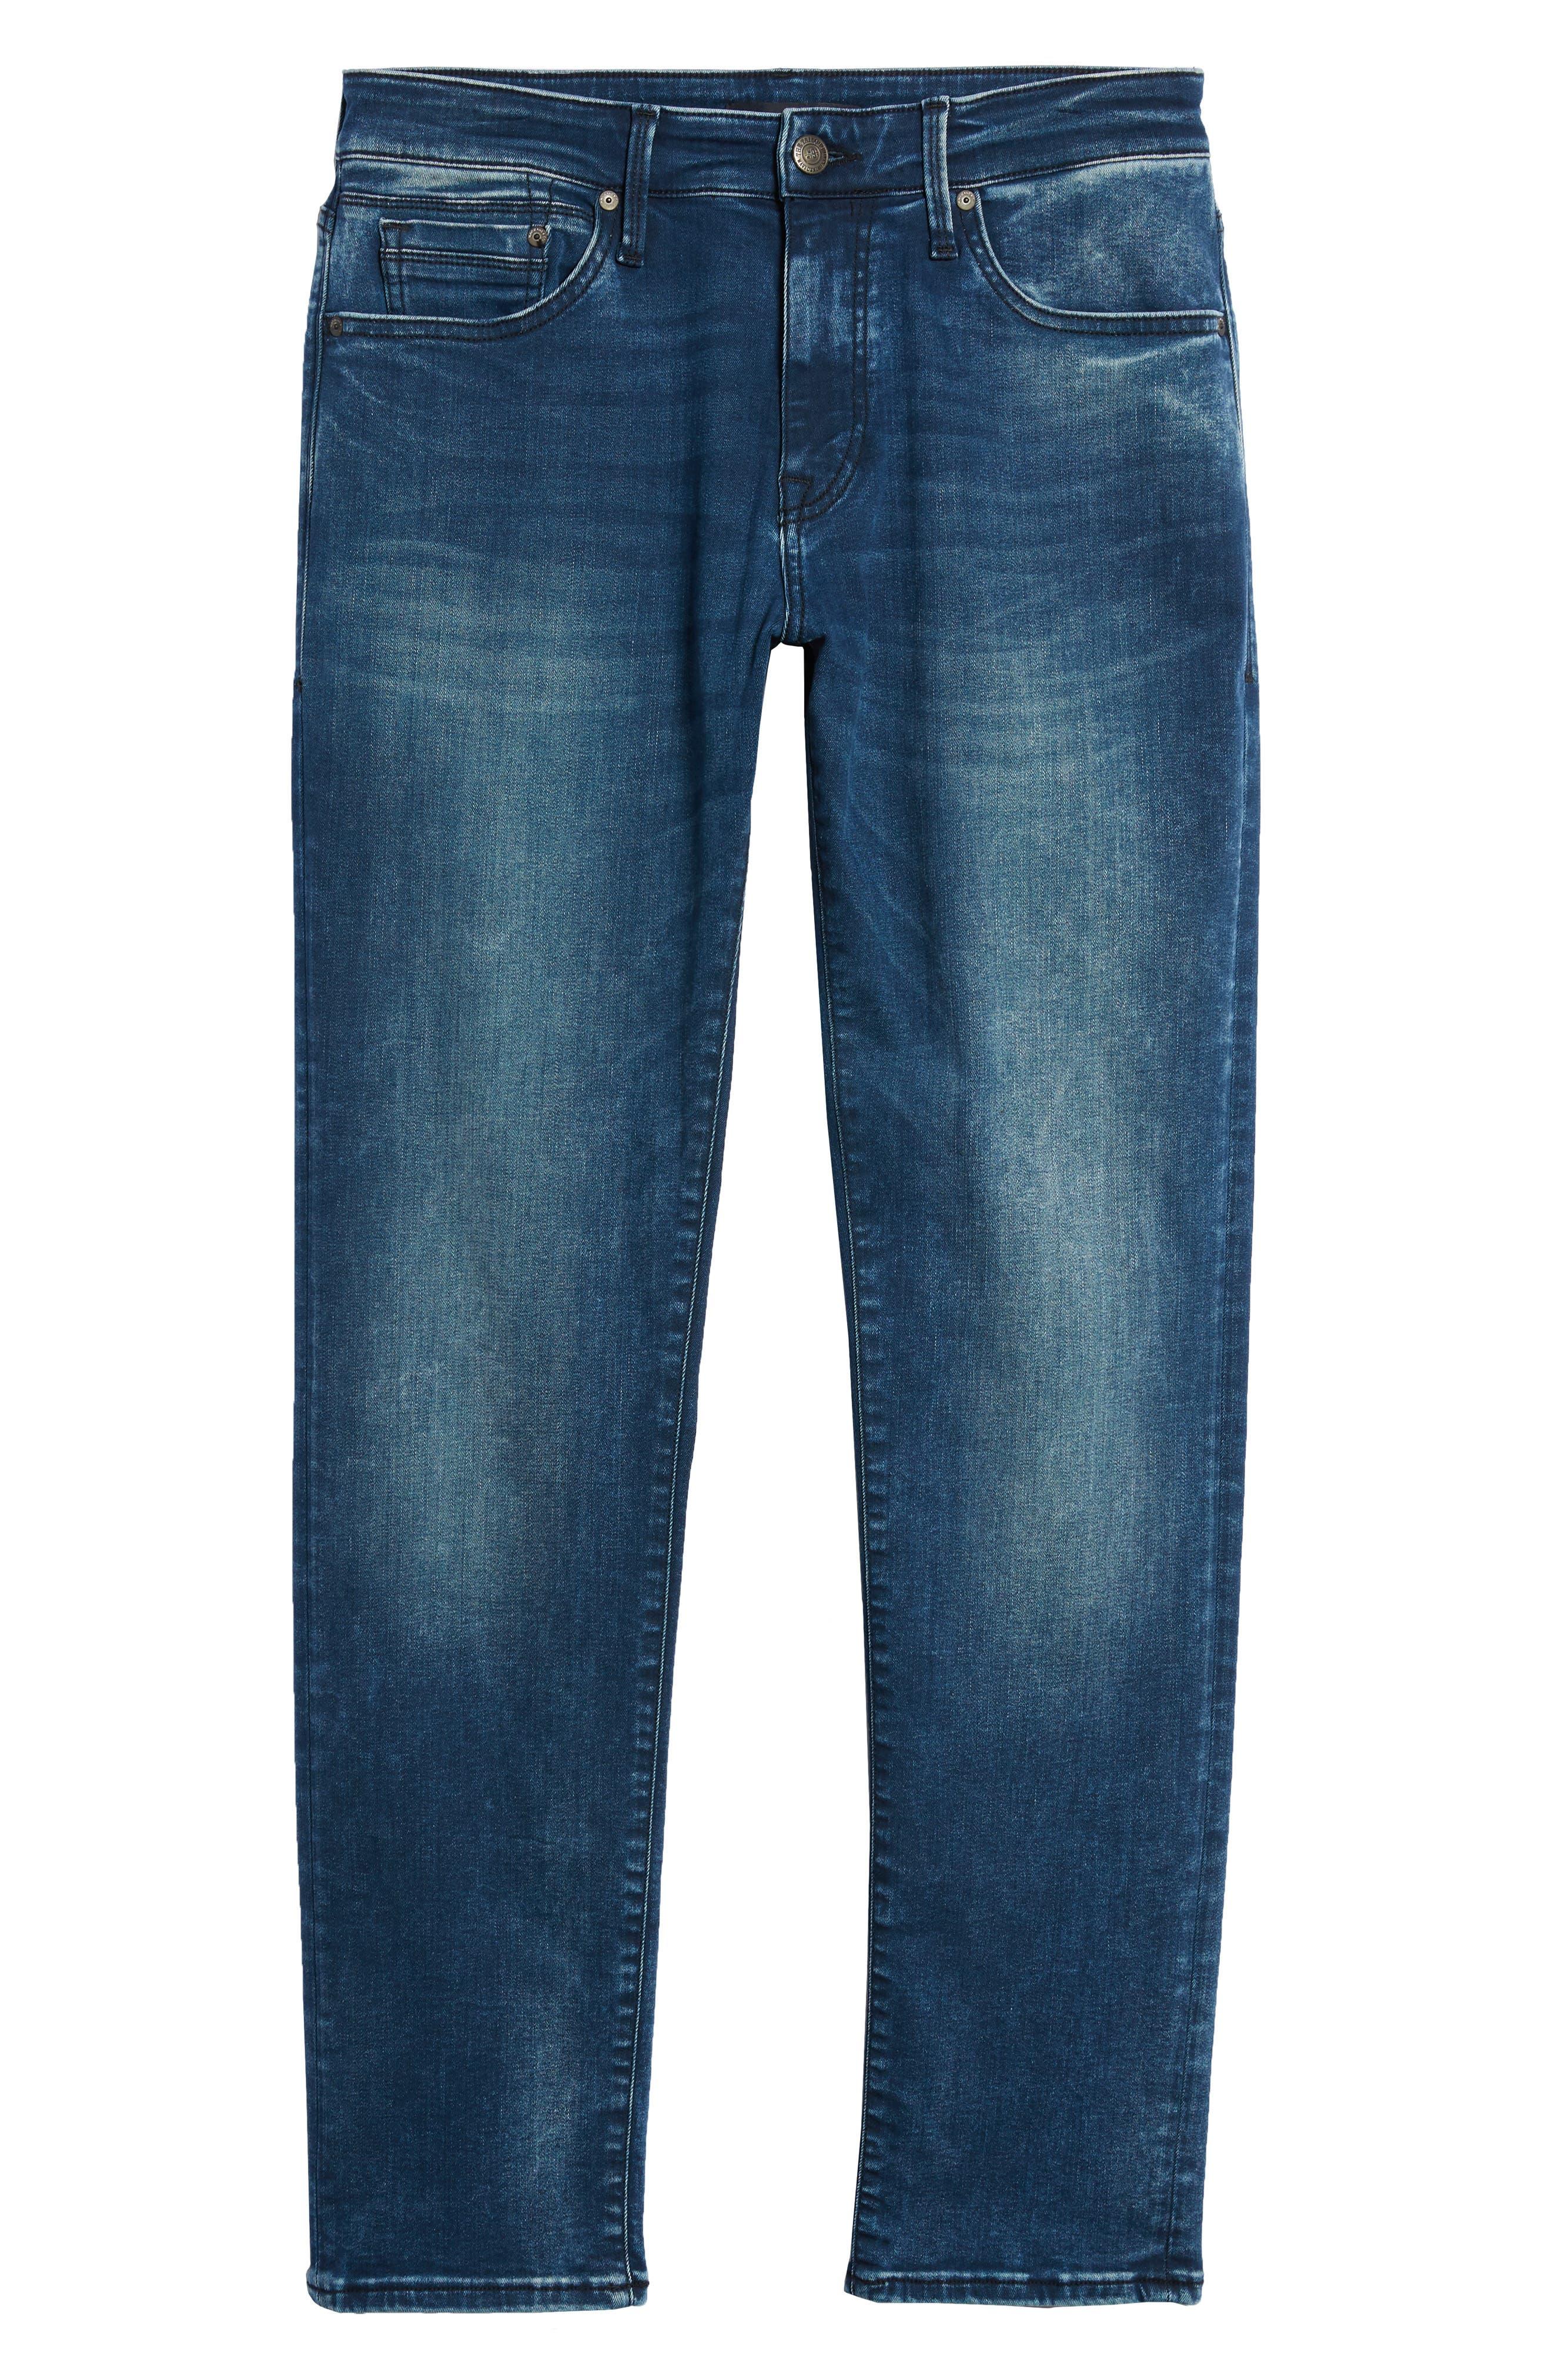 Marcus Slim Straight Leg Jeans,                             Alternate thumbnail 6, color,                             401